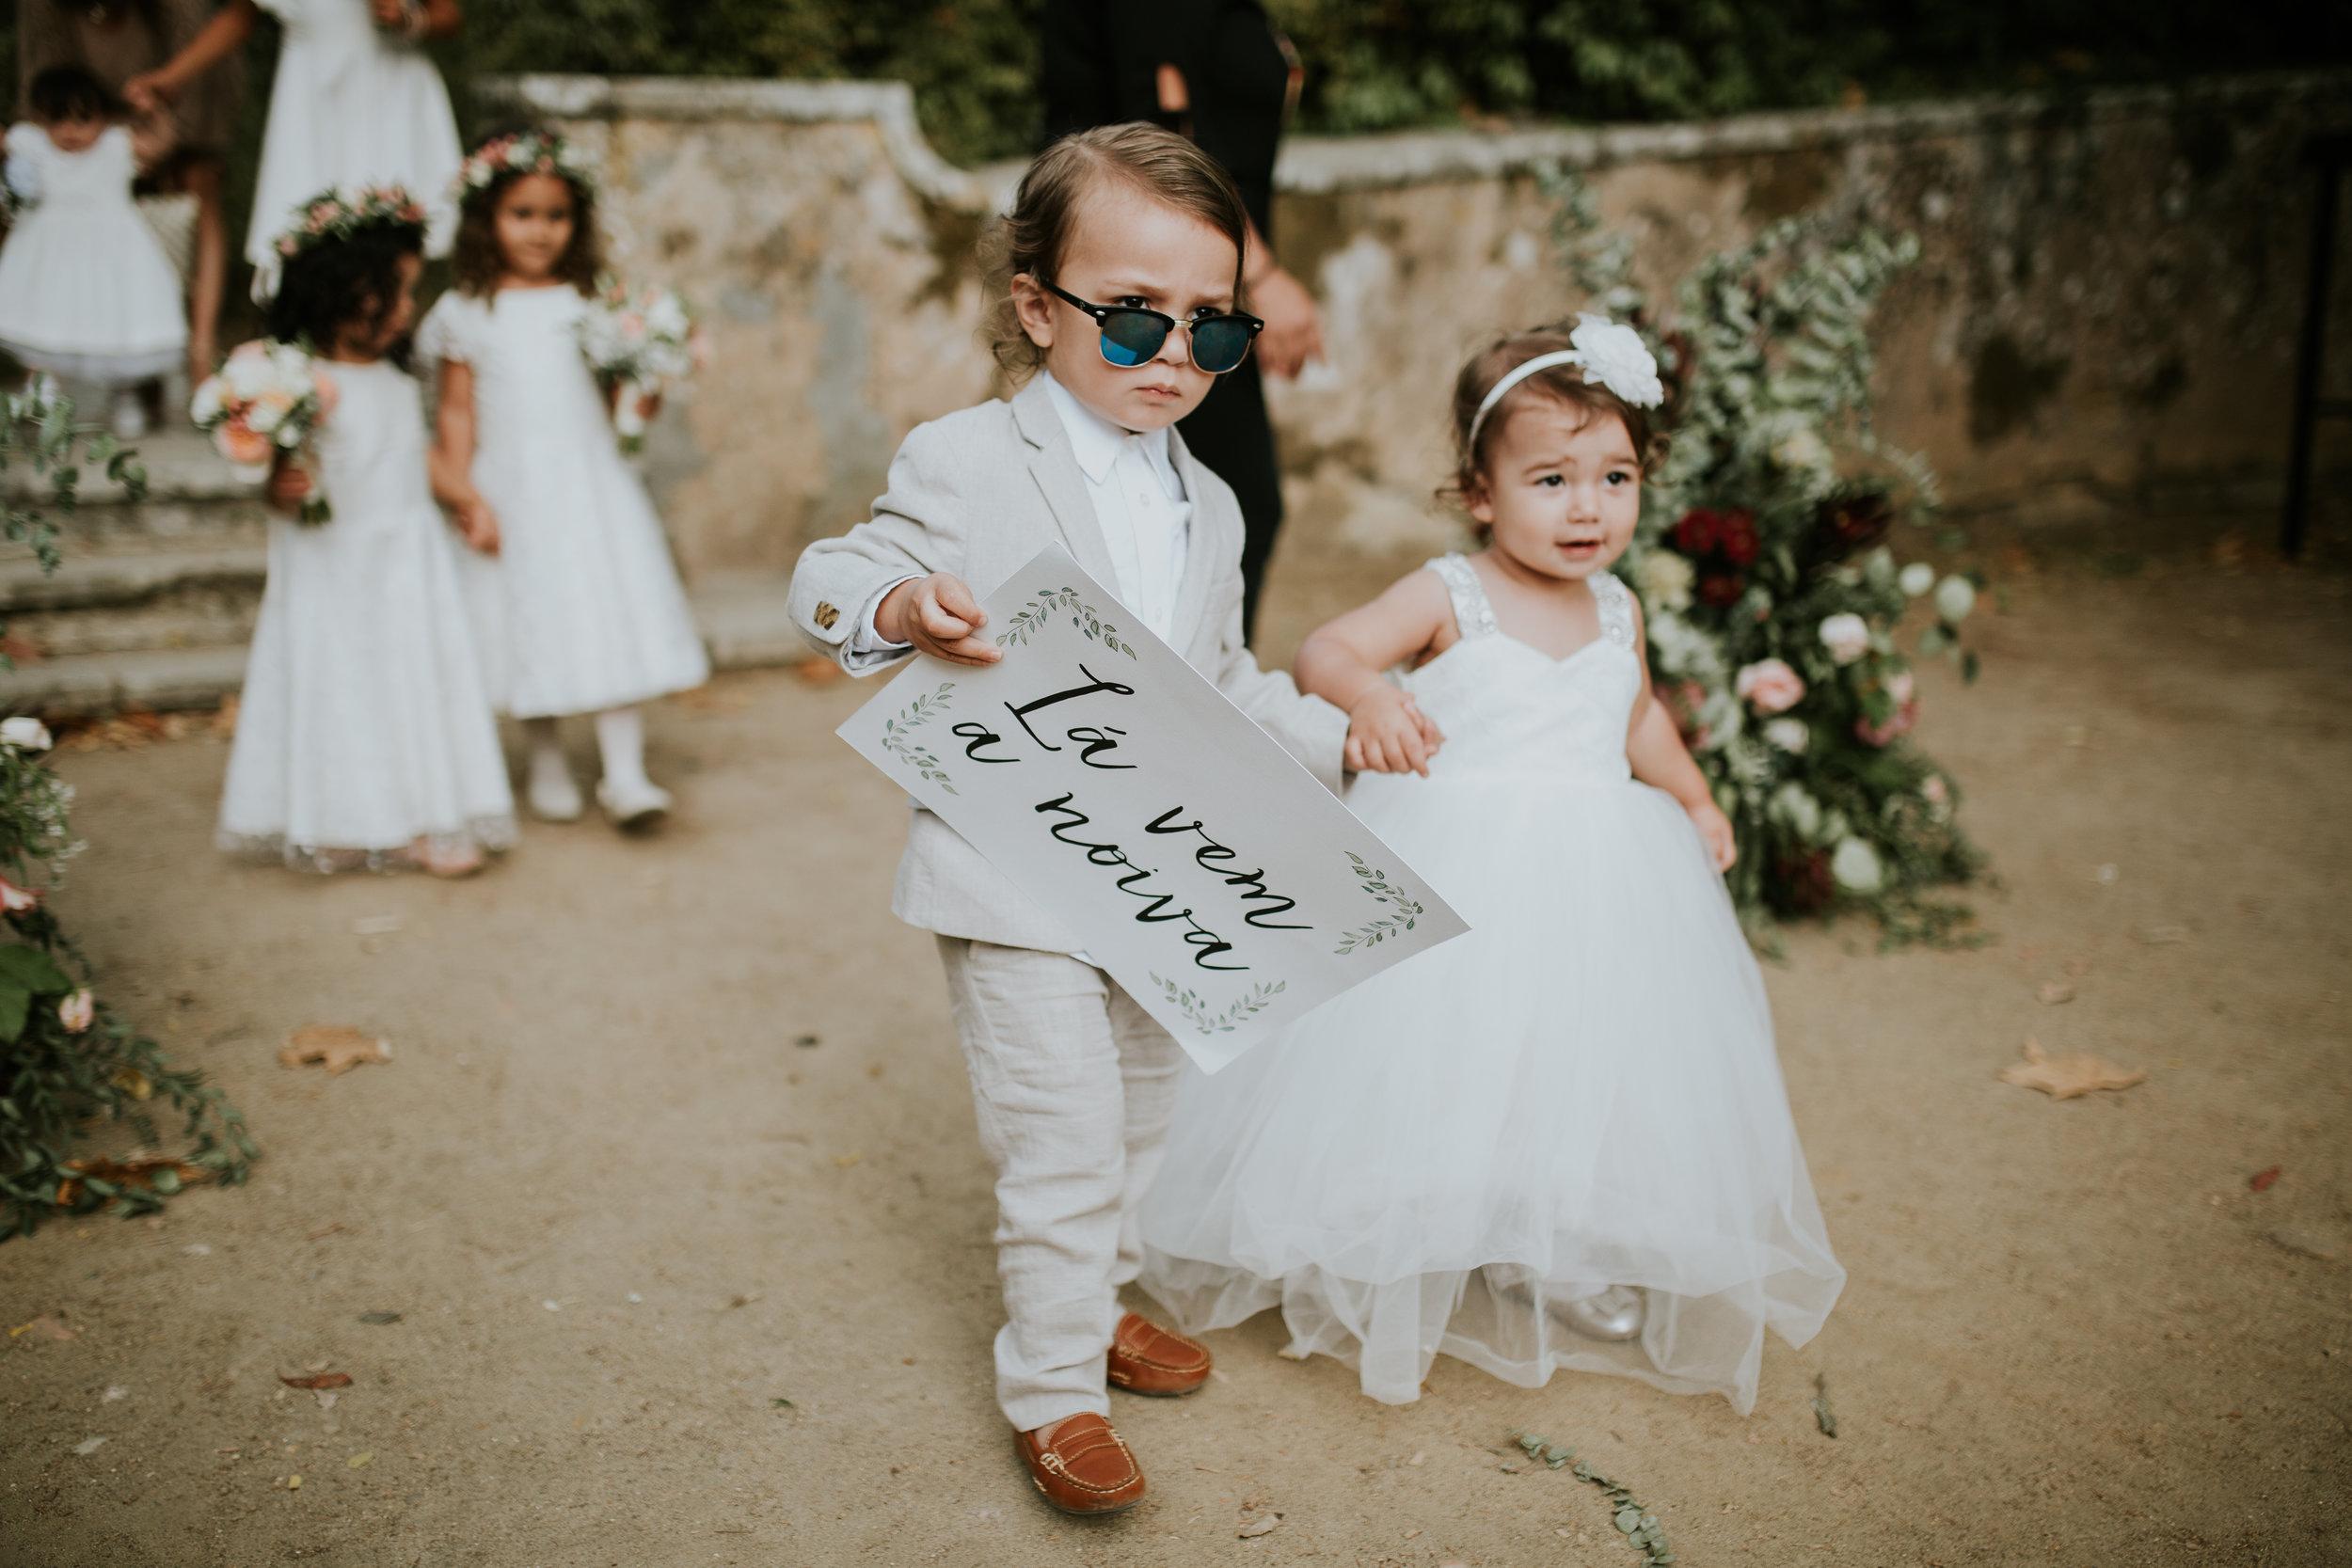 R&J190_ 09 setembro 2017 Wedding day_.jpg